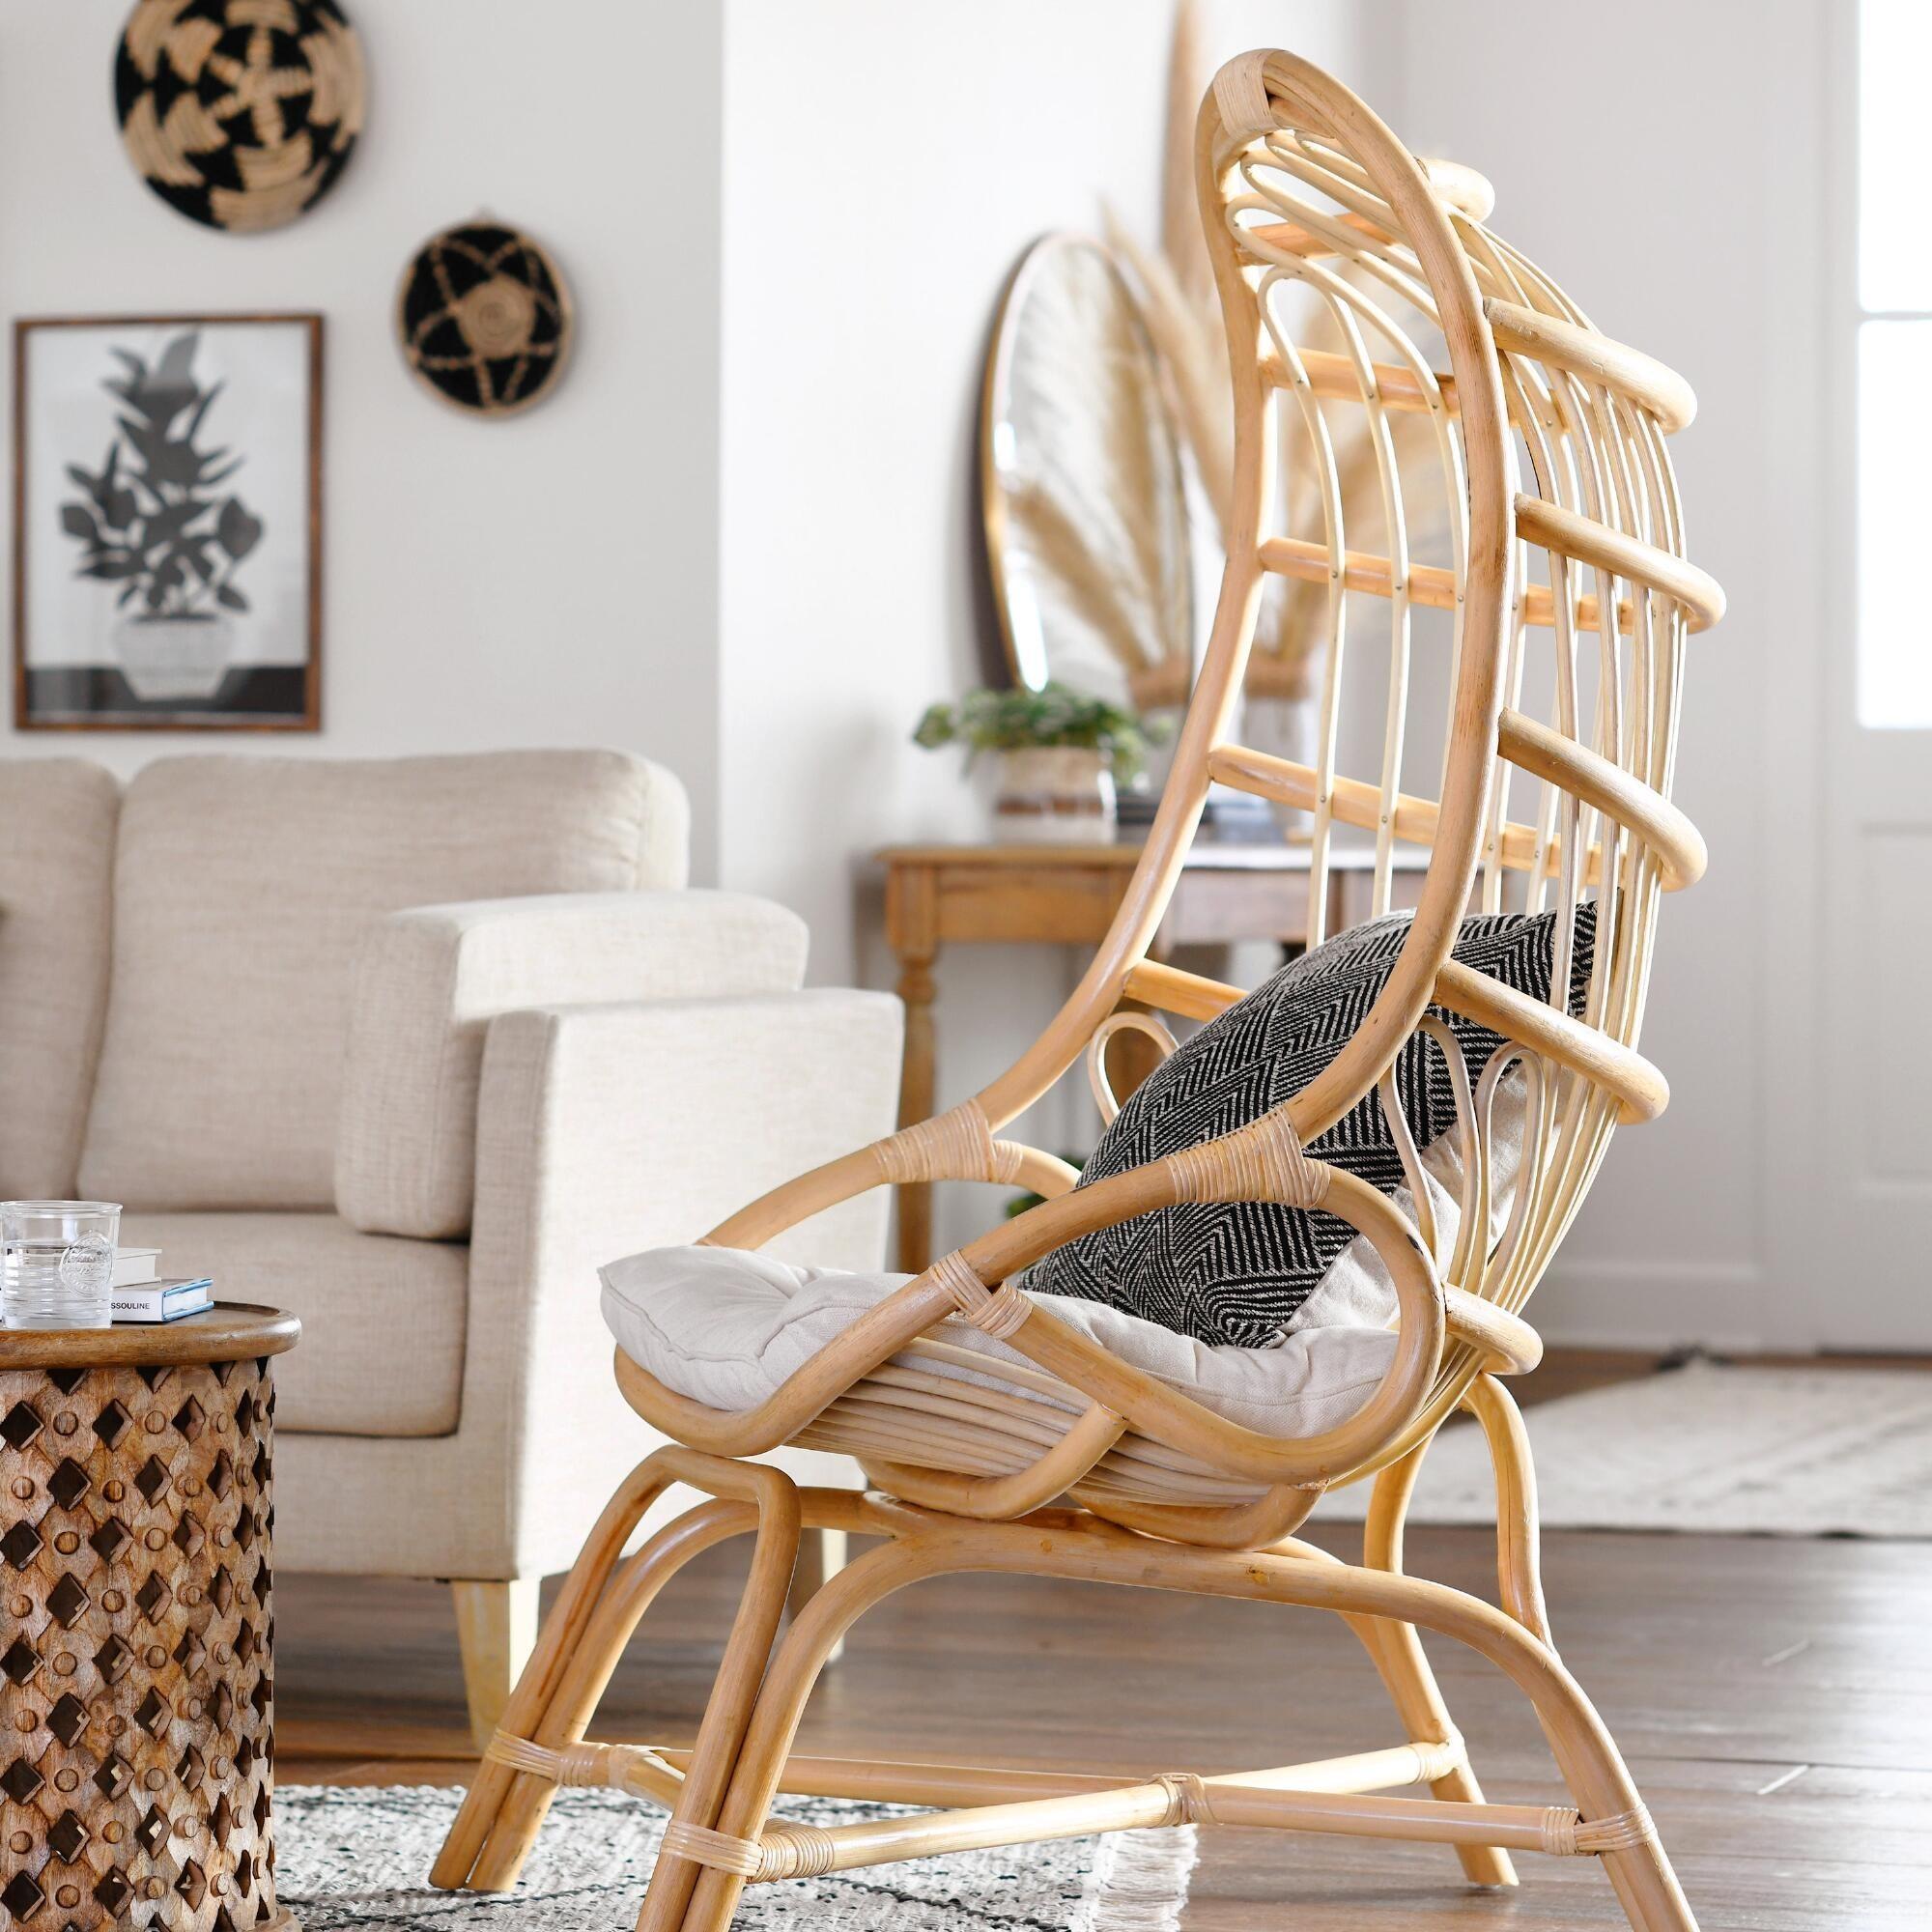 cocoon chair target online